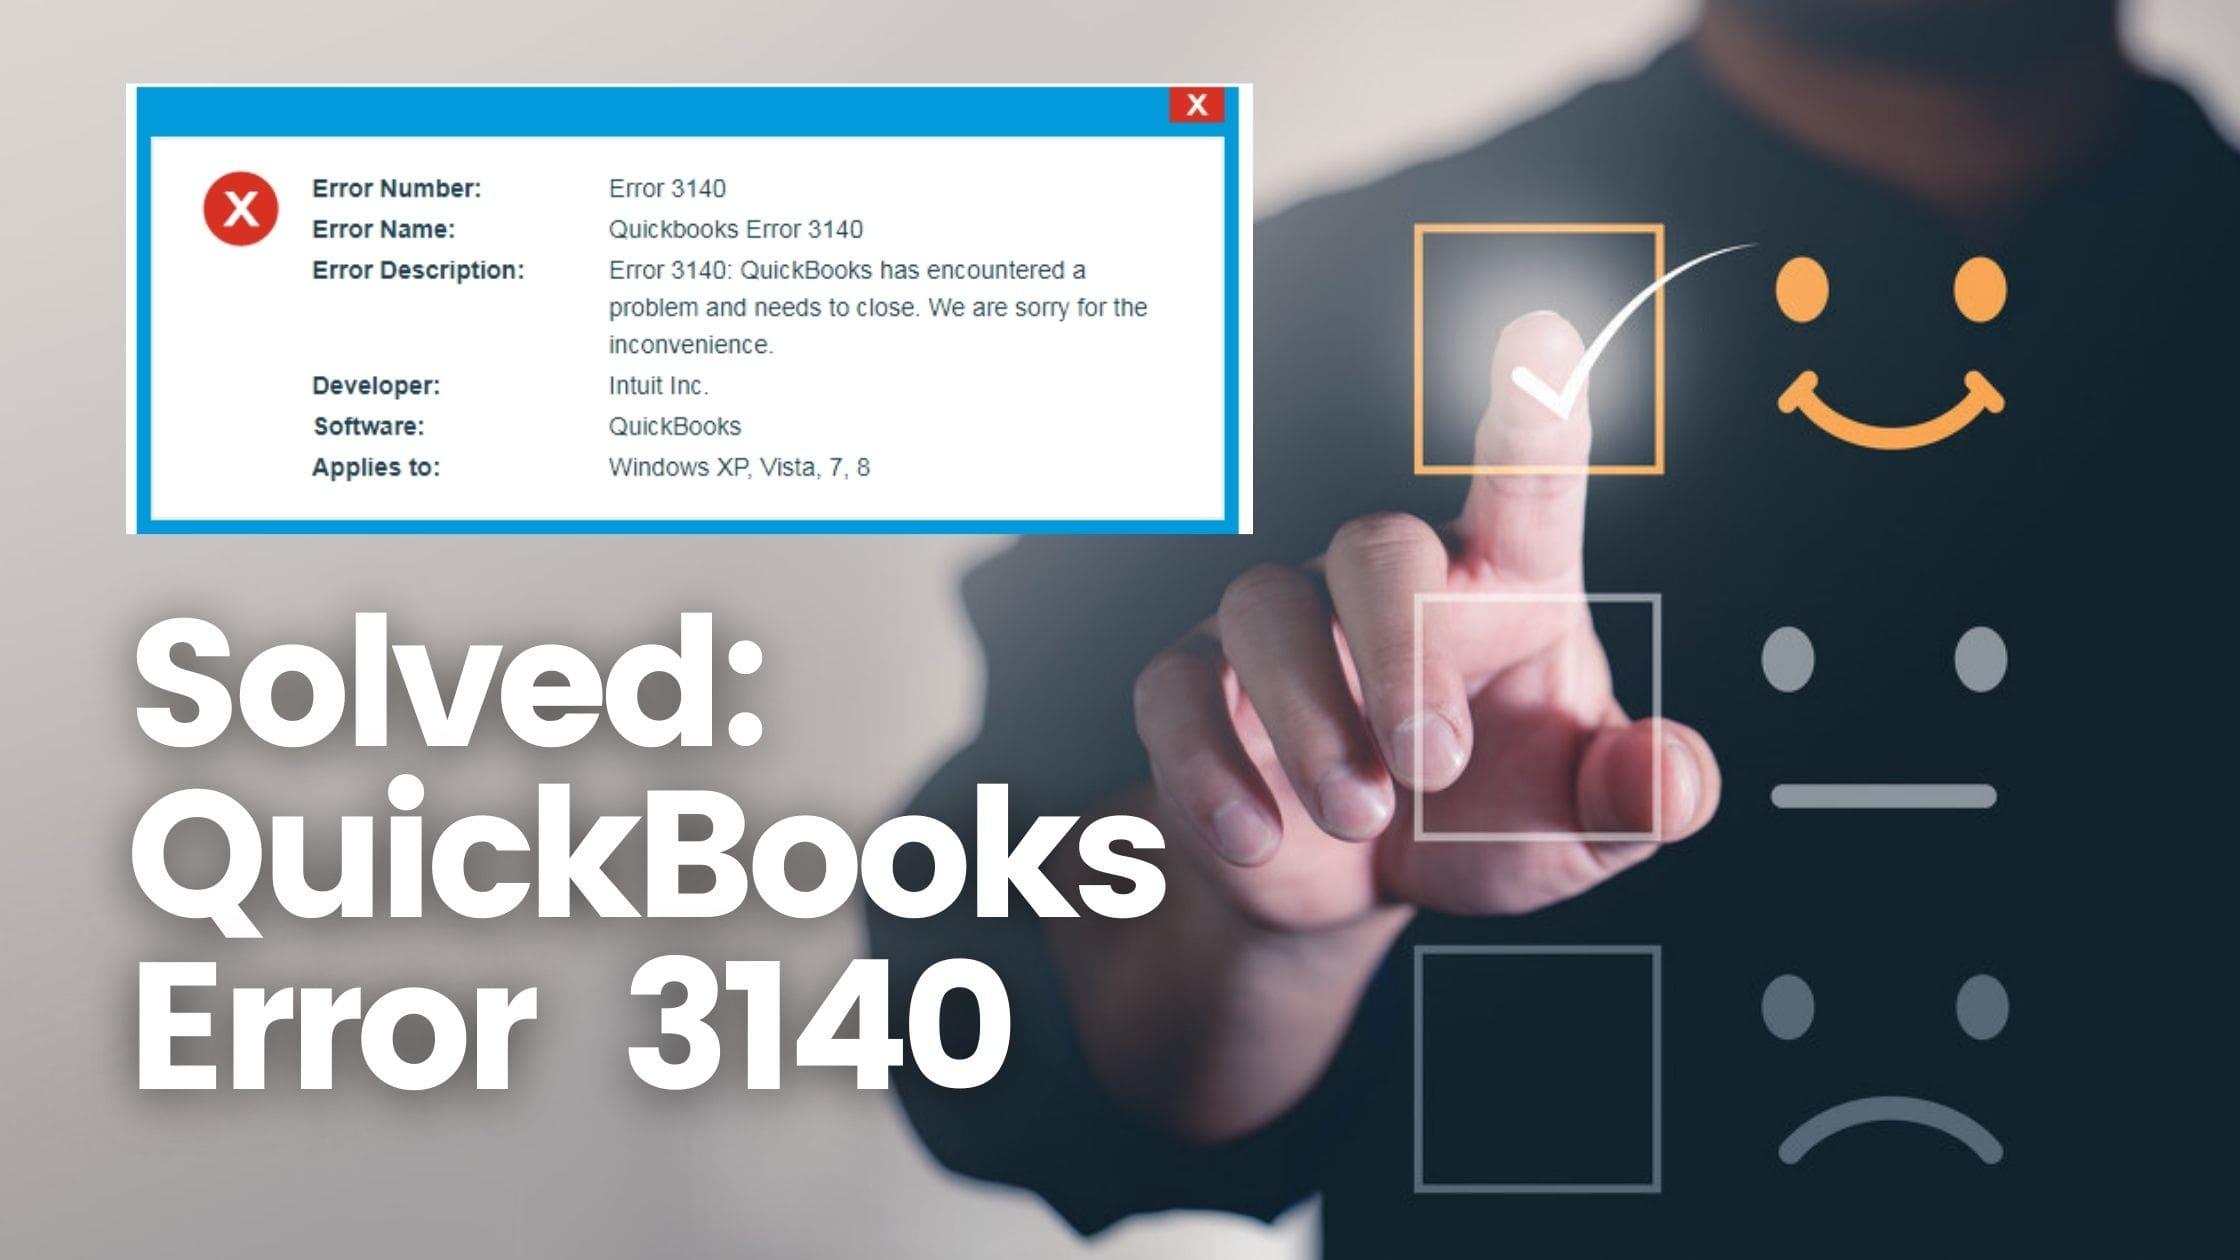 How To Solve QuickBooks Error 3140?